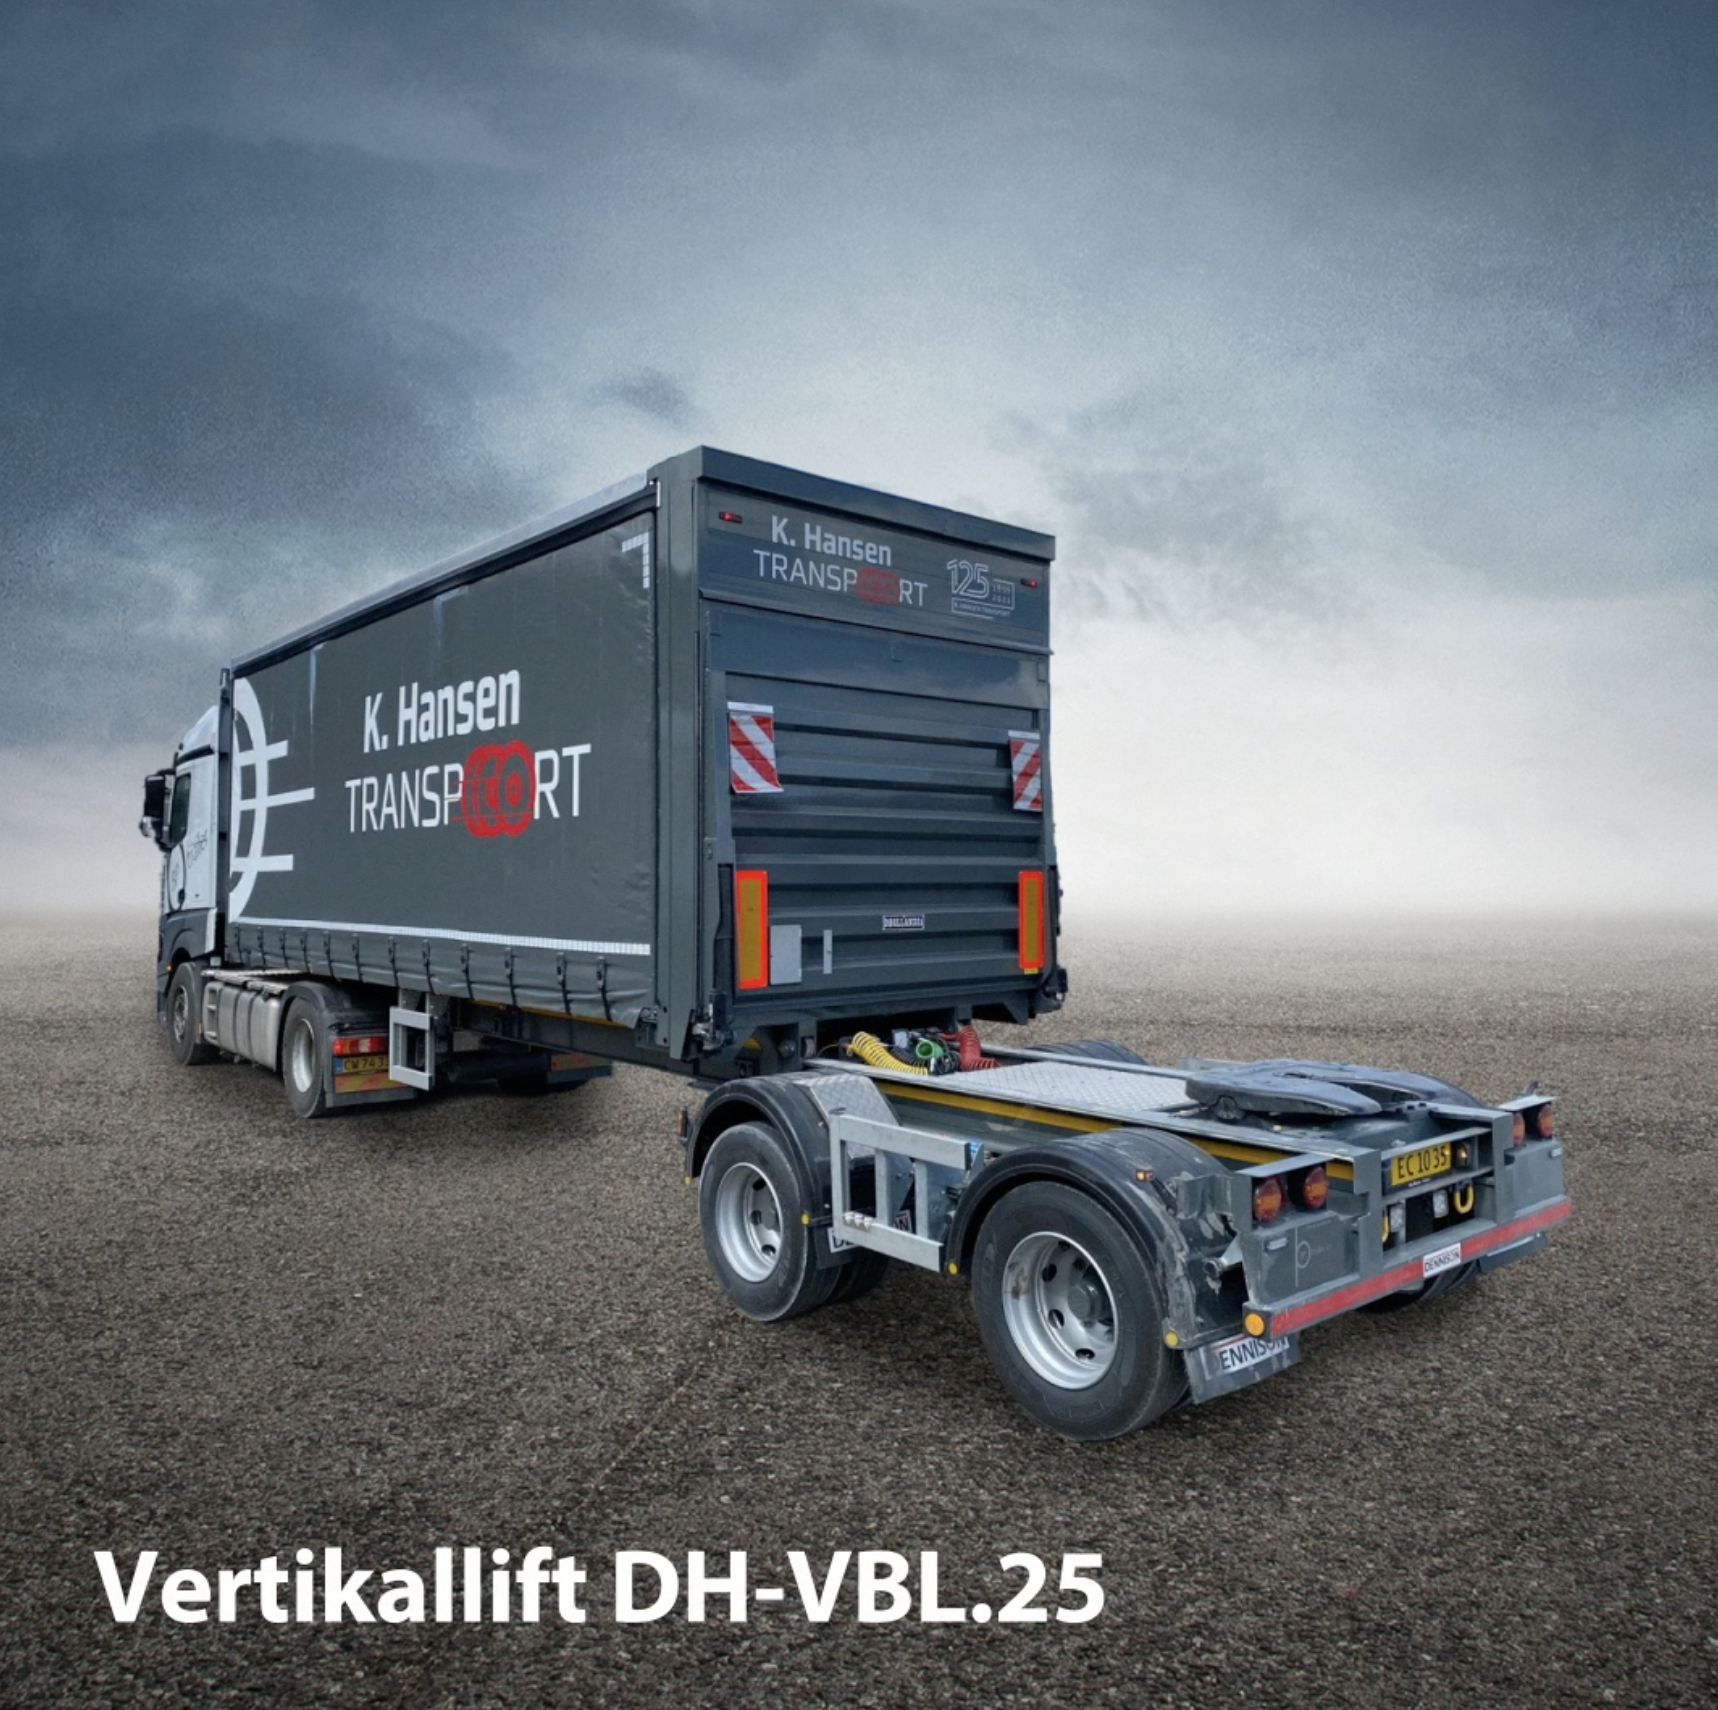 Vertikallilft DH-VBL.25